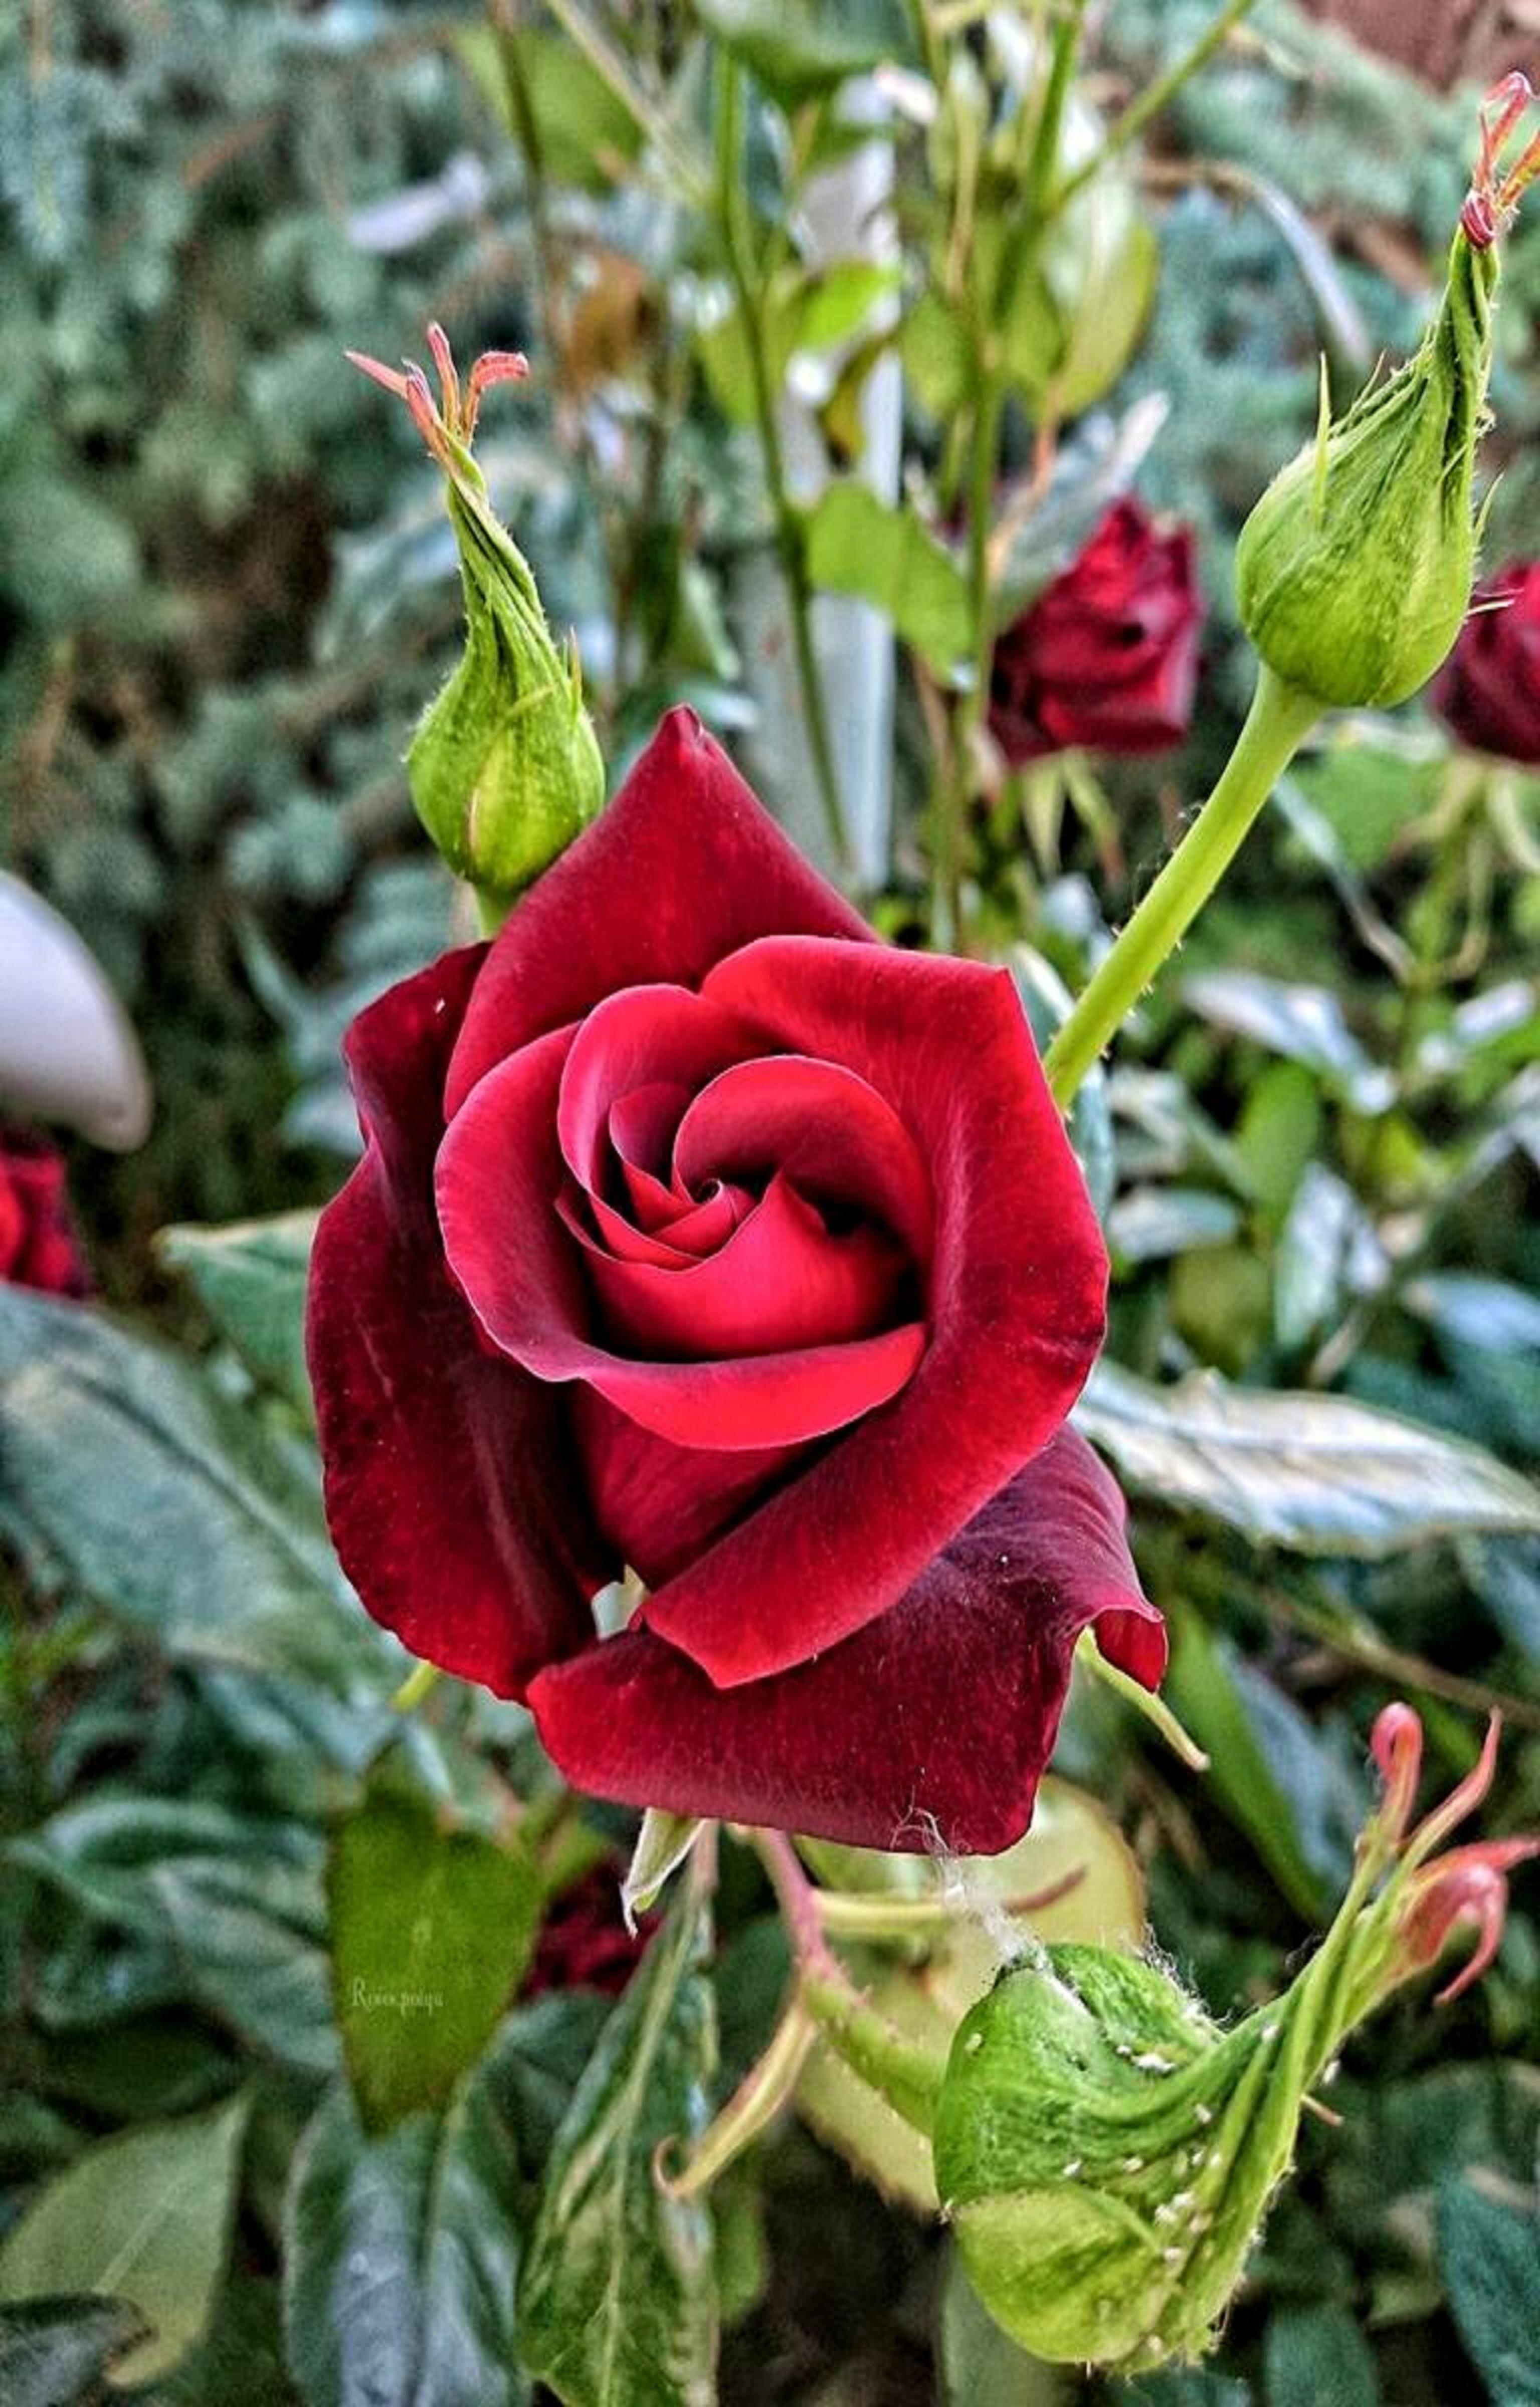 Pin by ivanka kostova on растения Rose, Flowers, Plants